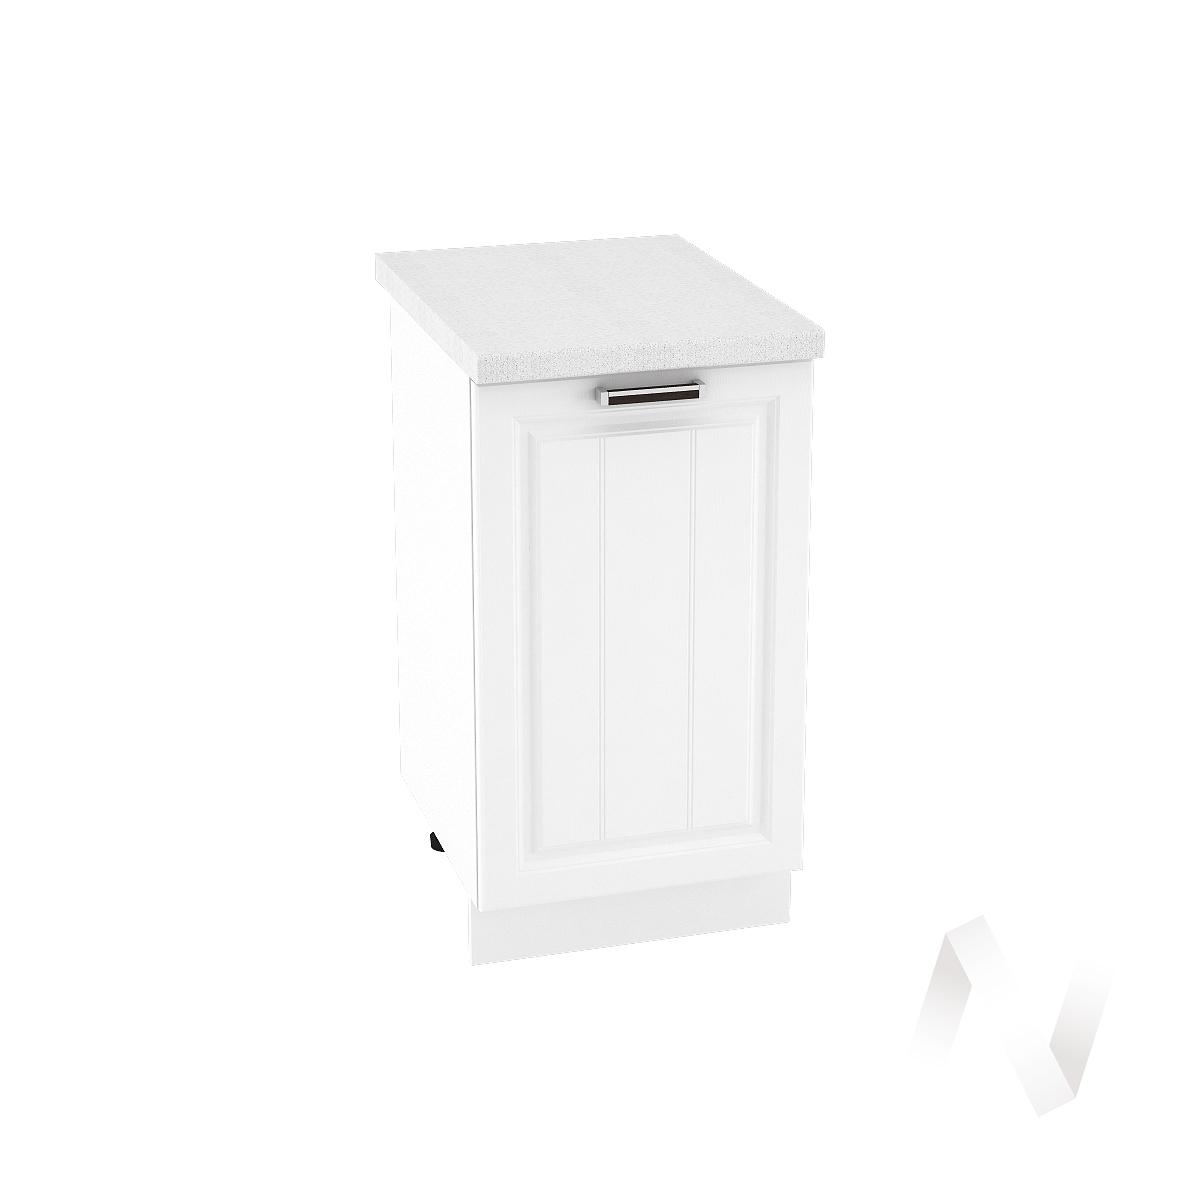 "Кухня ""Прага"": Шкаф нижний 450, ШН 450 (белое дерево/корпус белый)"